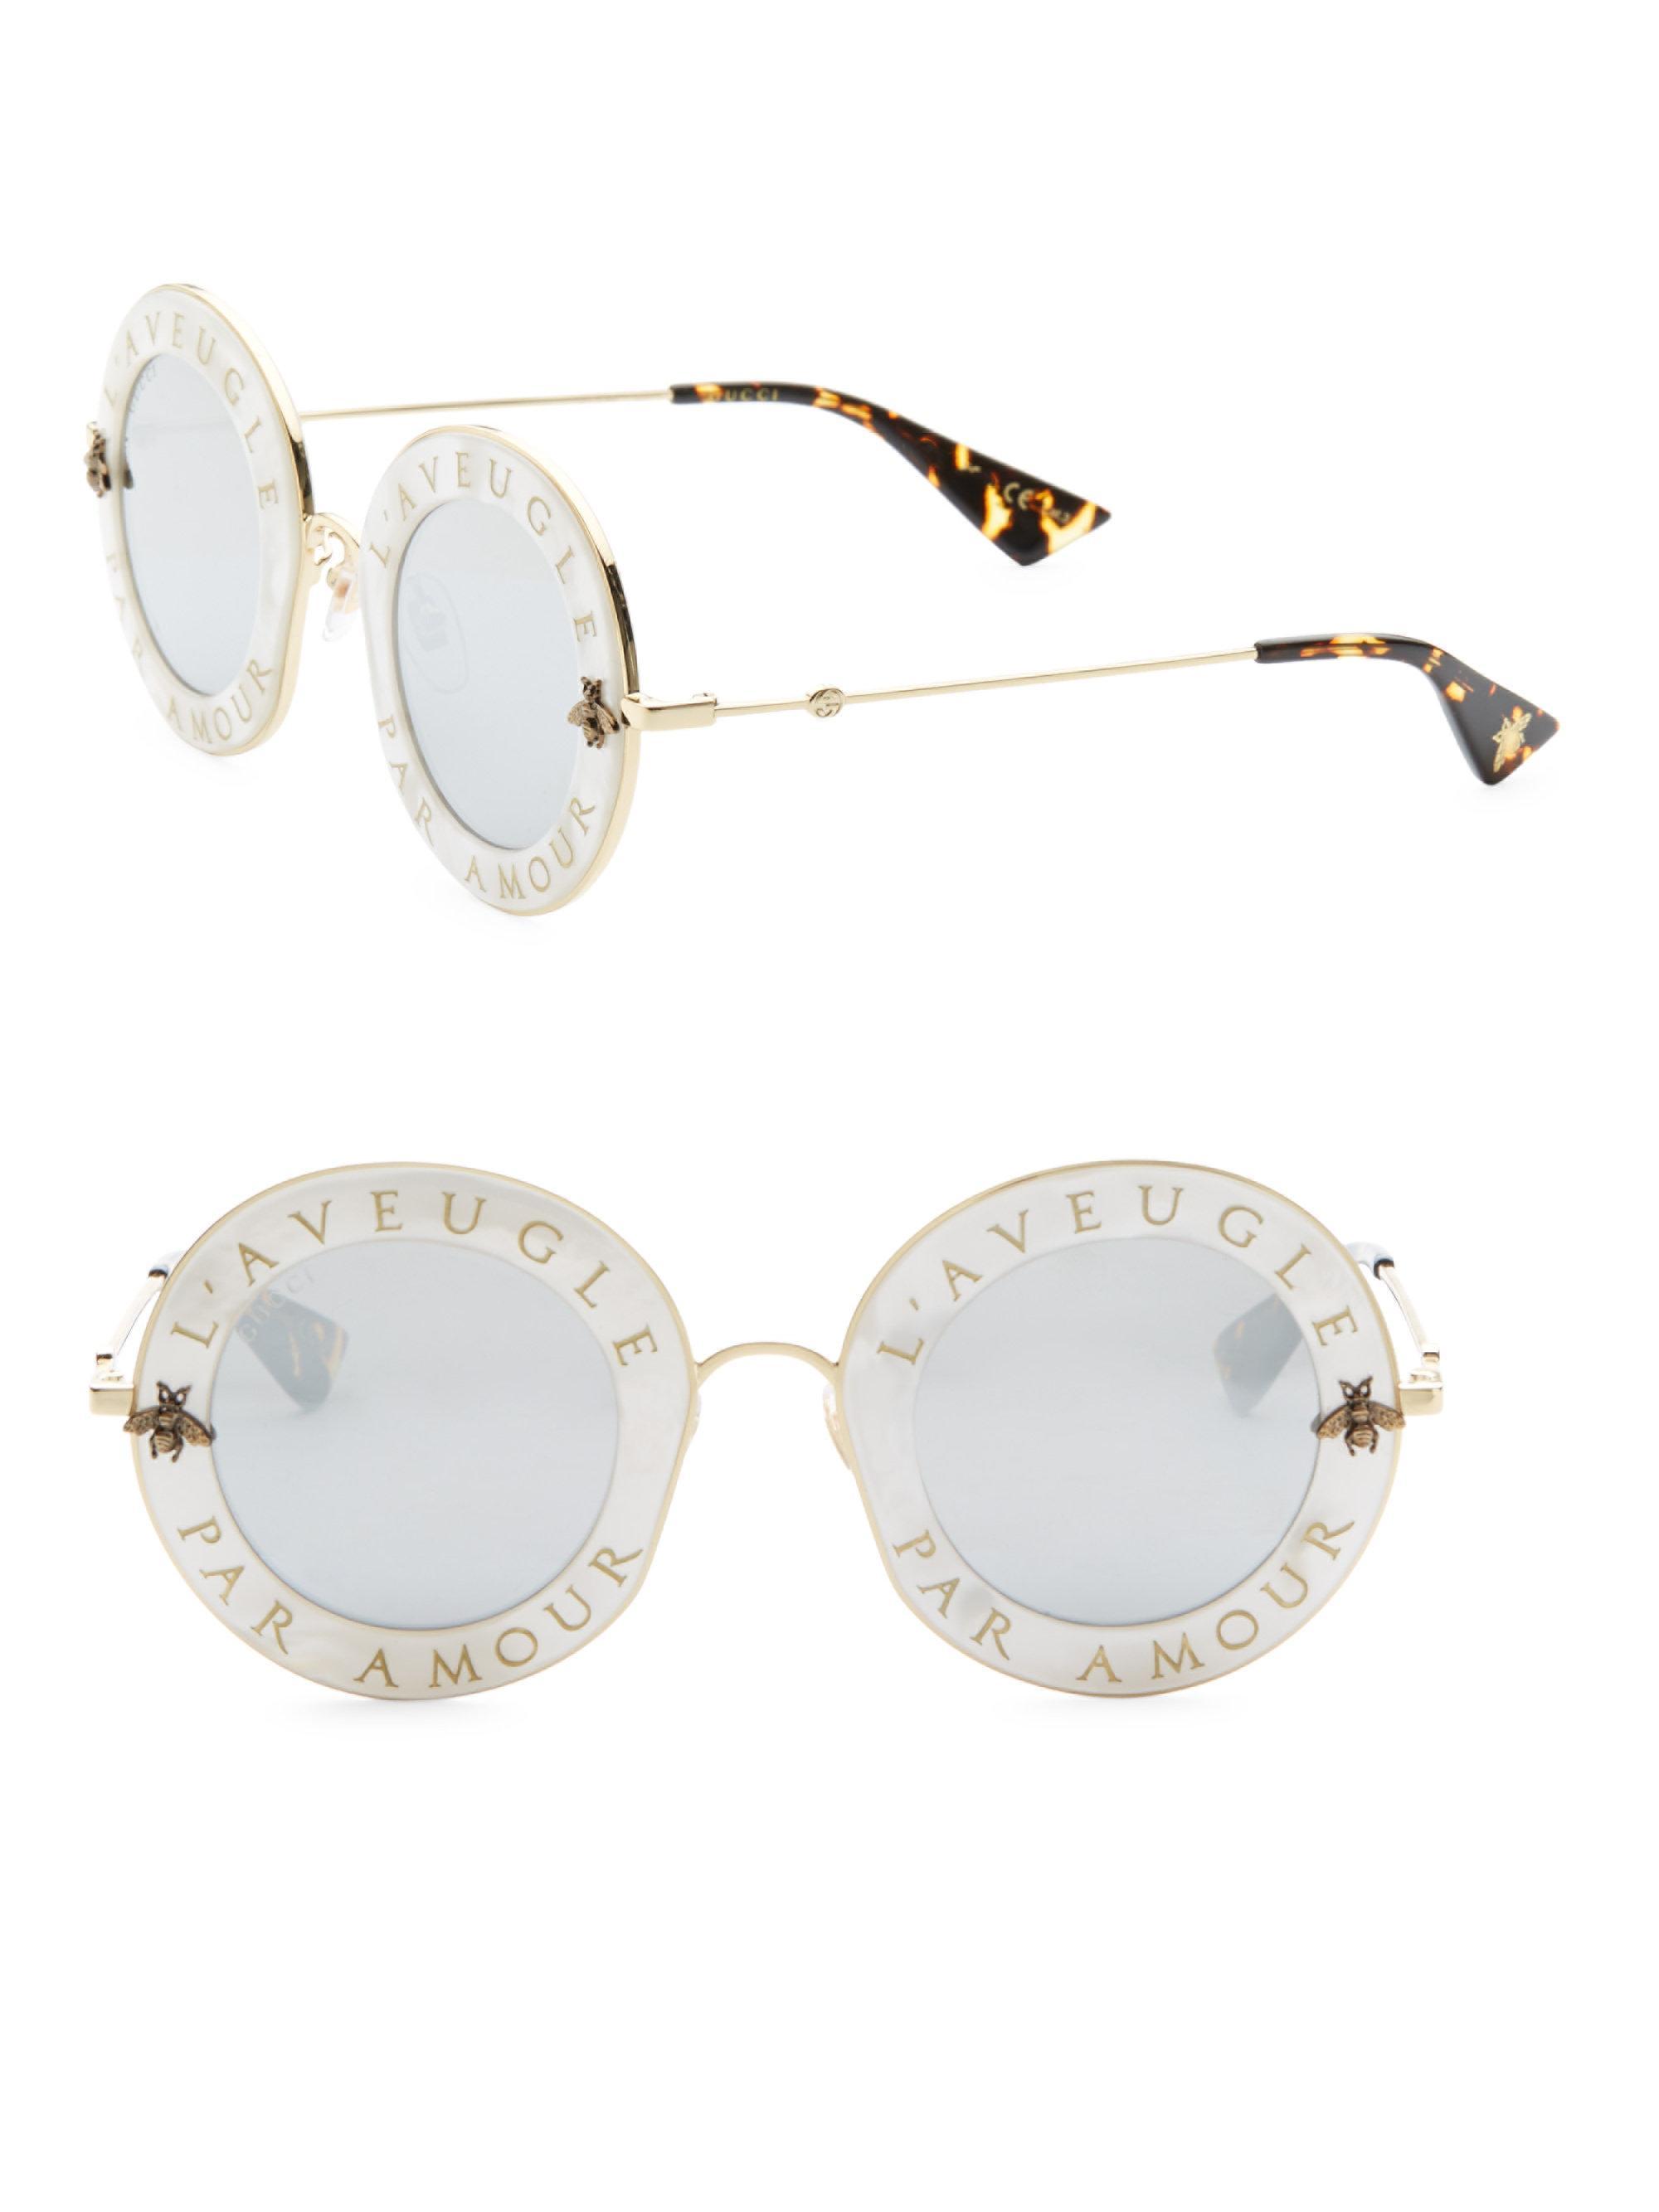 29b3c29bf95 Lyst - Gucci 44mm L aveugle Par Amour Round Sunglasses in White